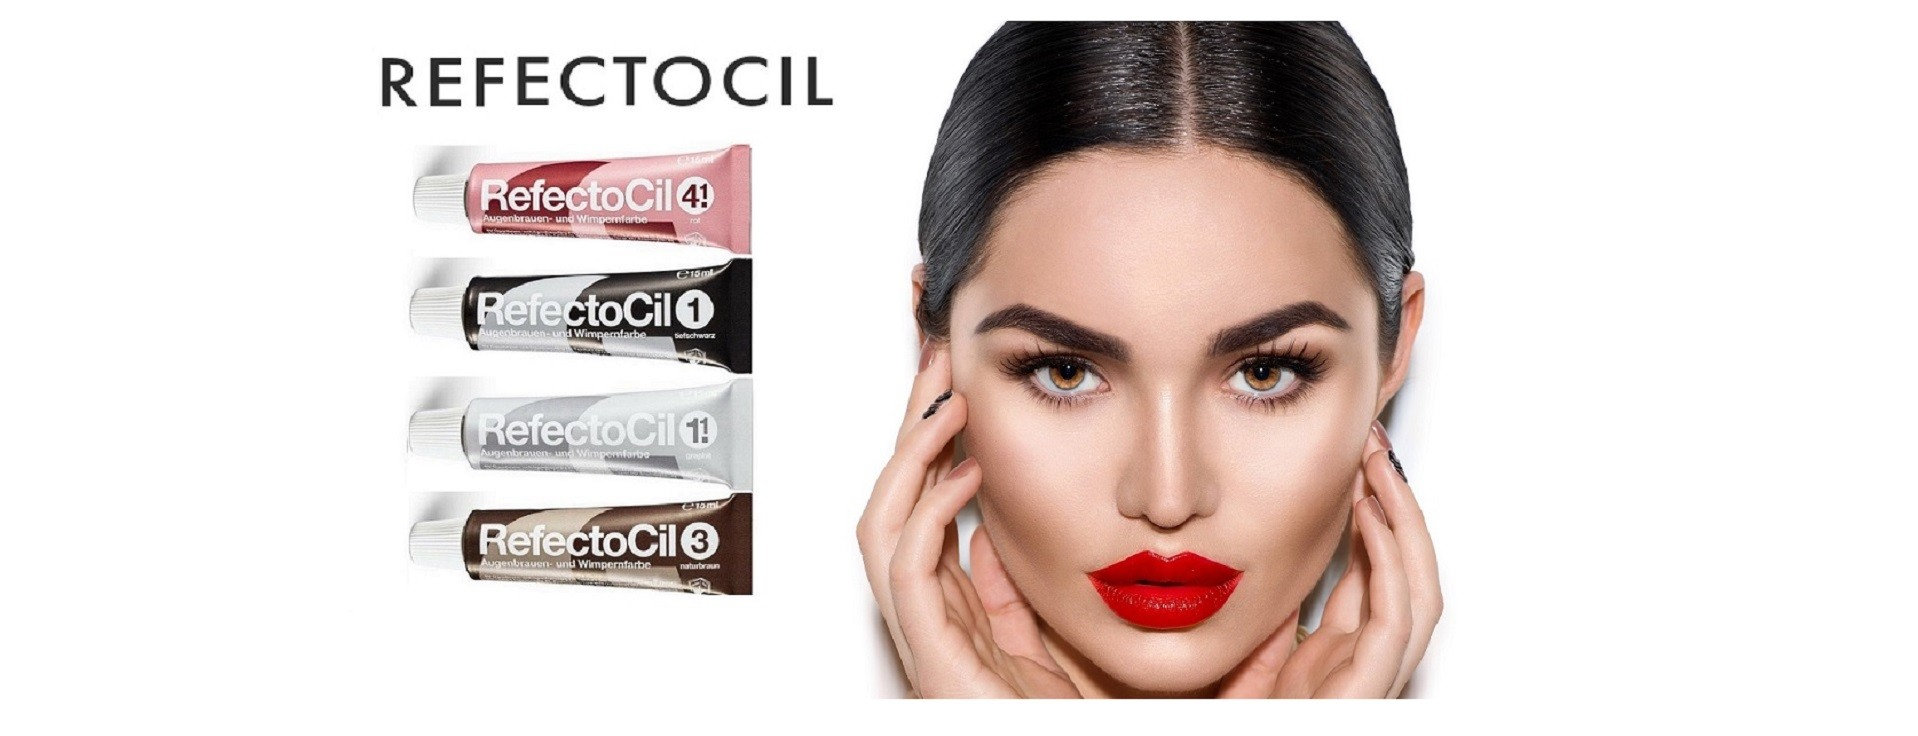 Refectocil Eyelash and Eyebrow Tint